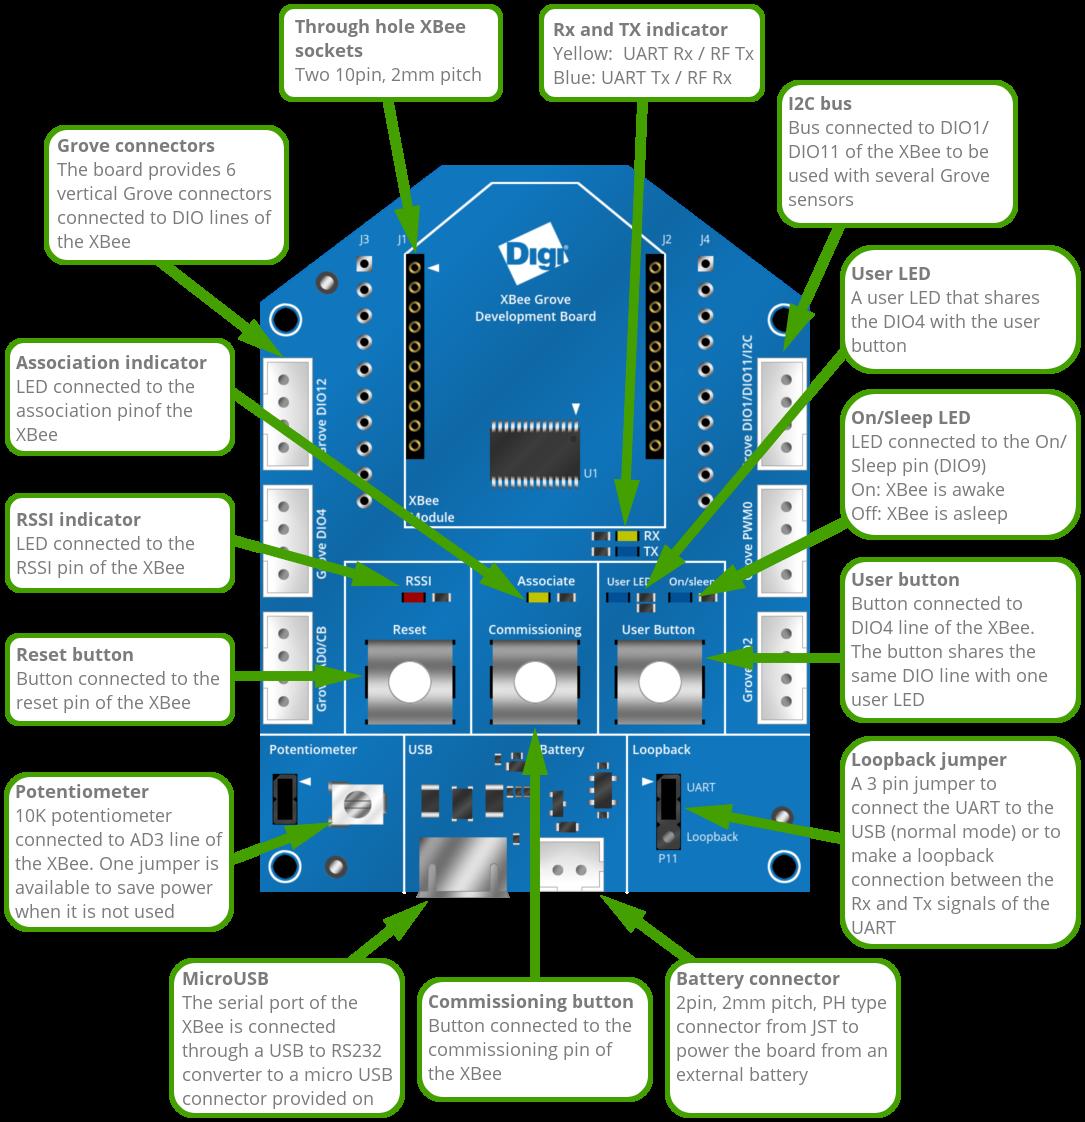 grove_board_connectors